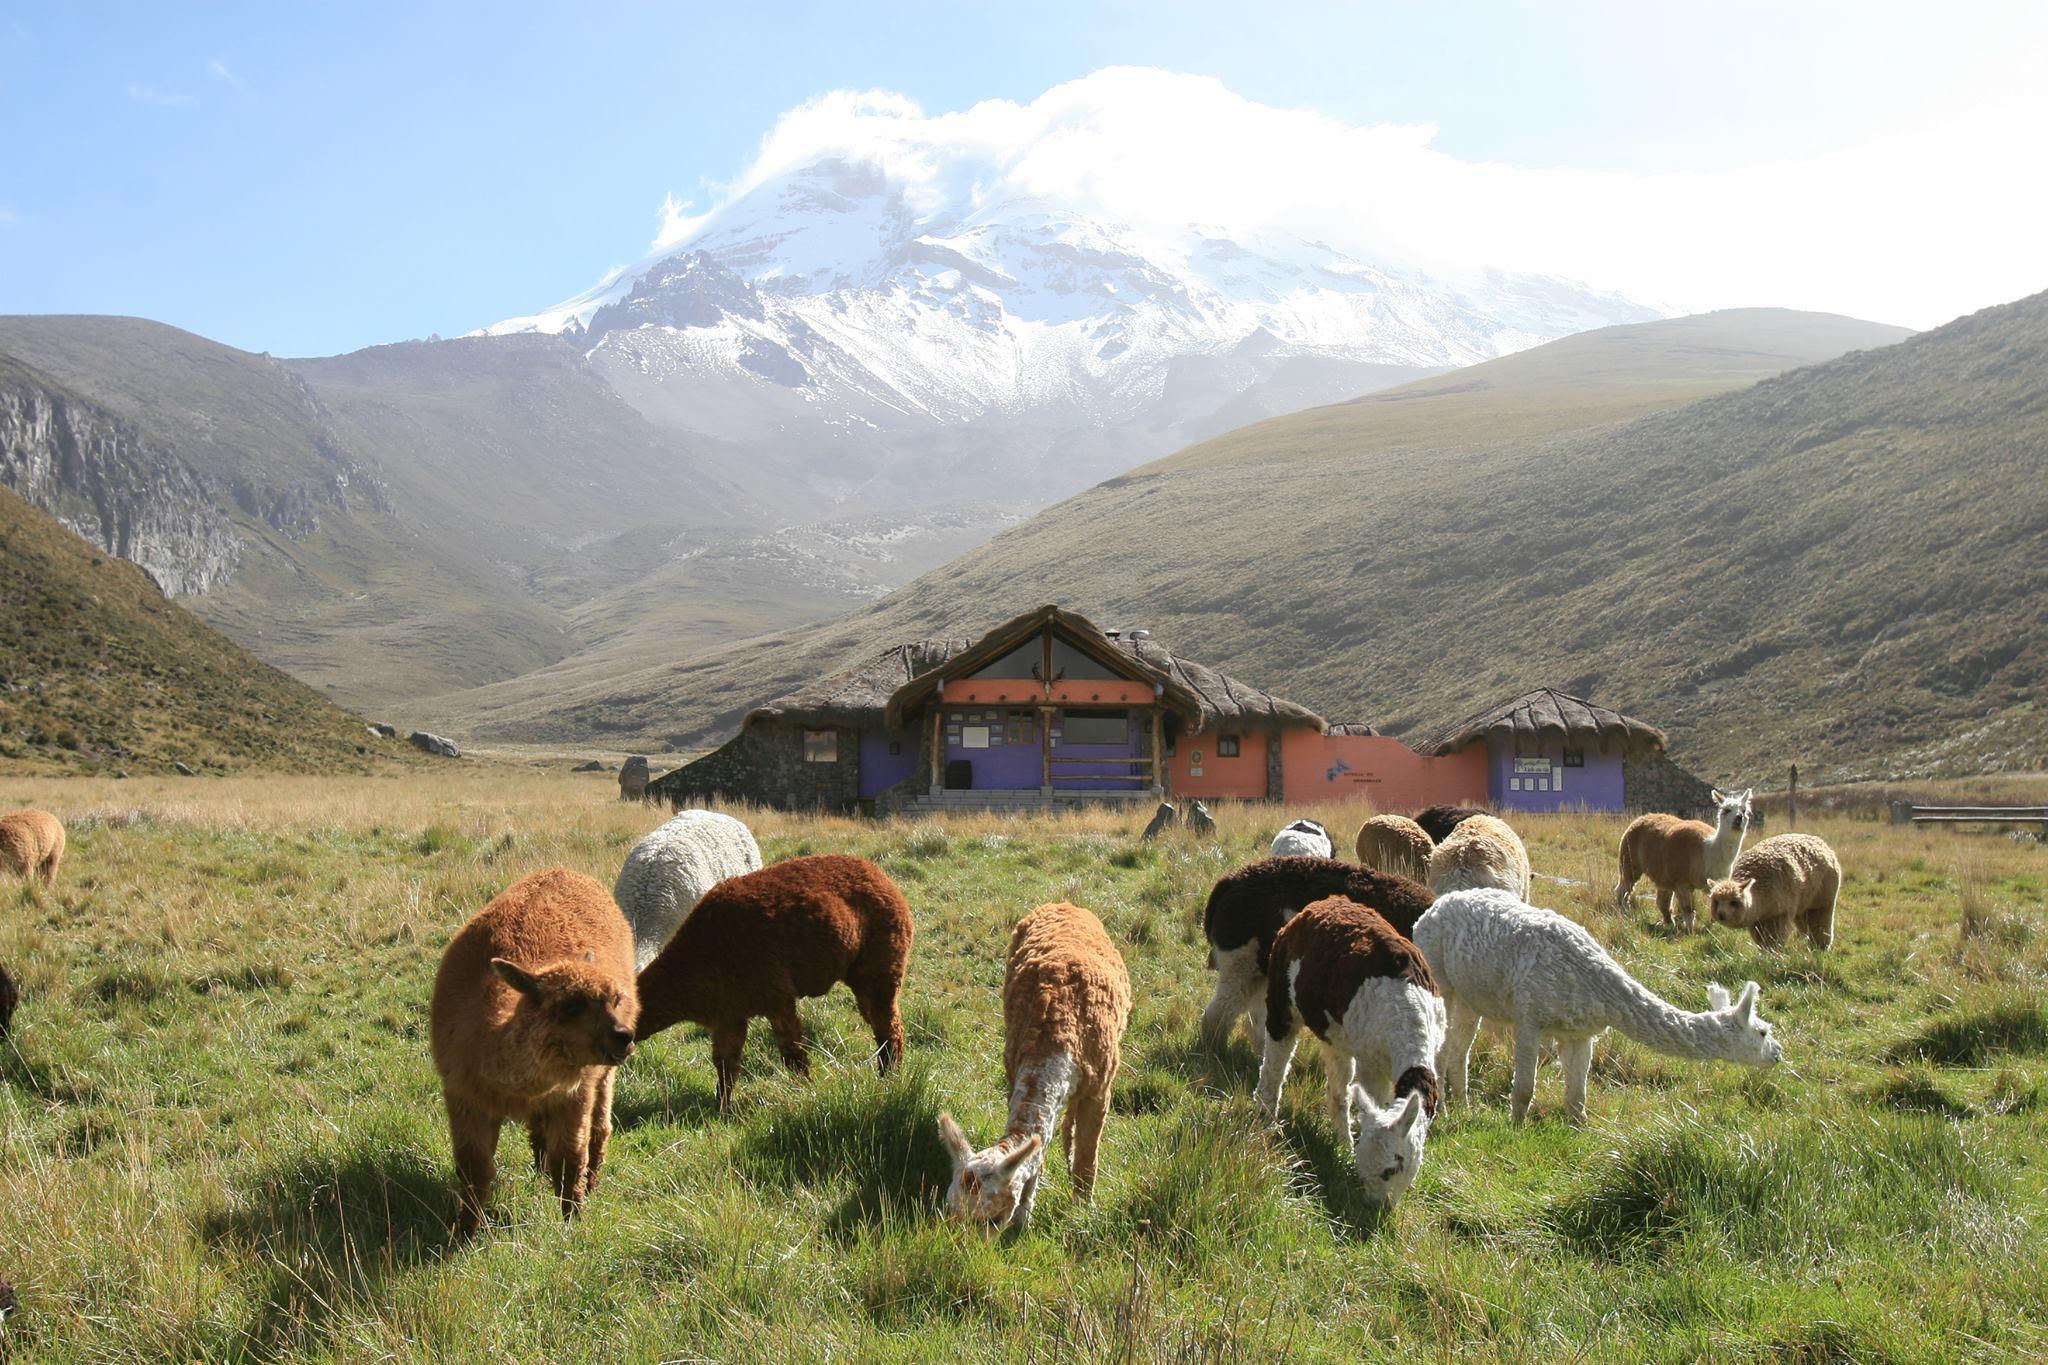 Lamas near Chimborazo Volcano in Highalnds